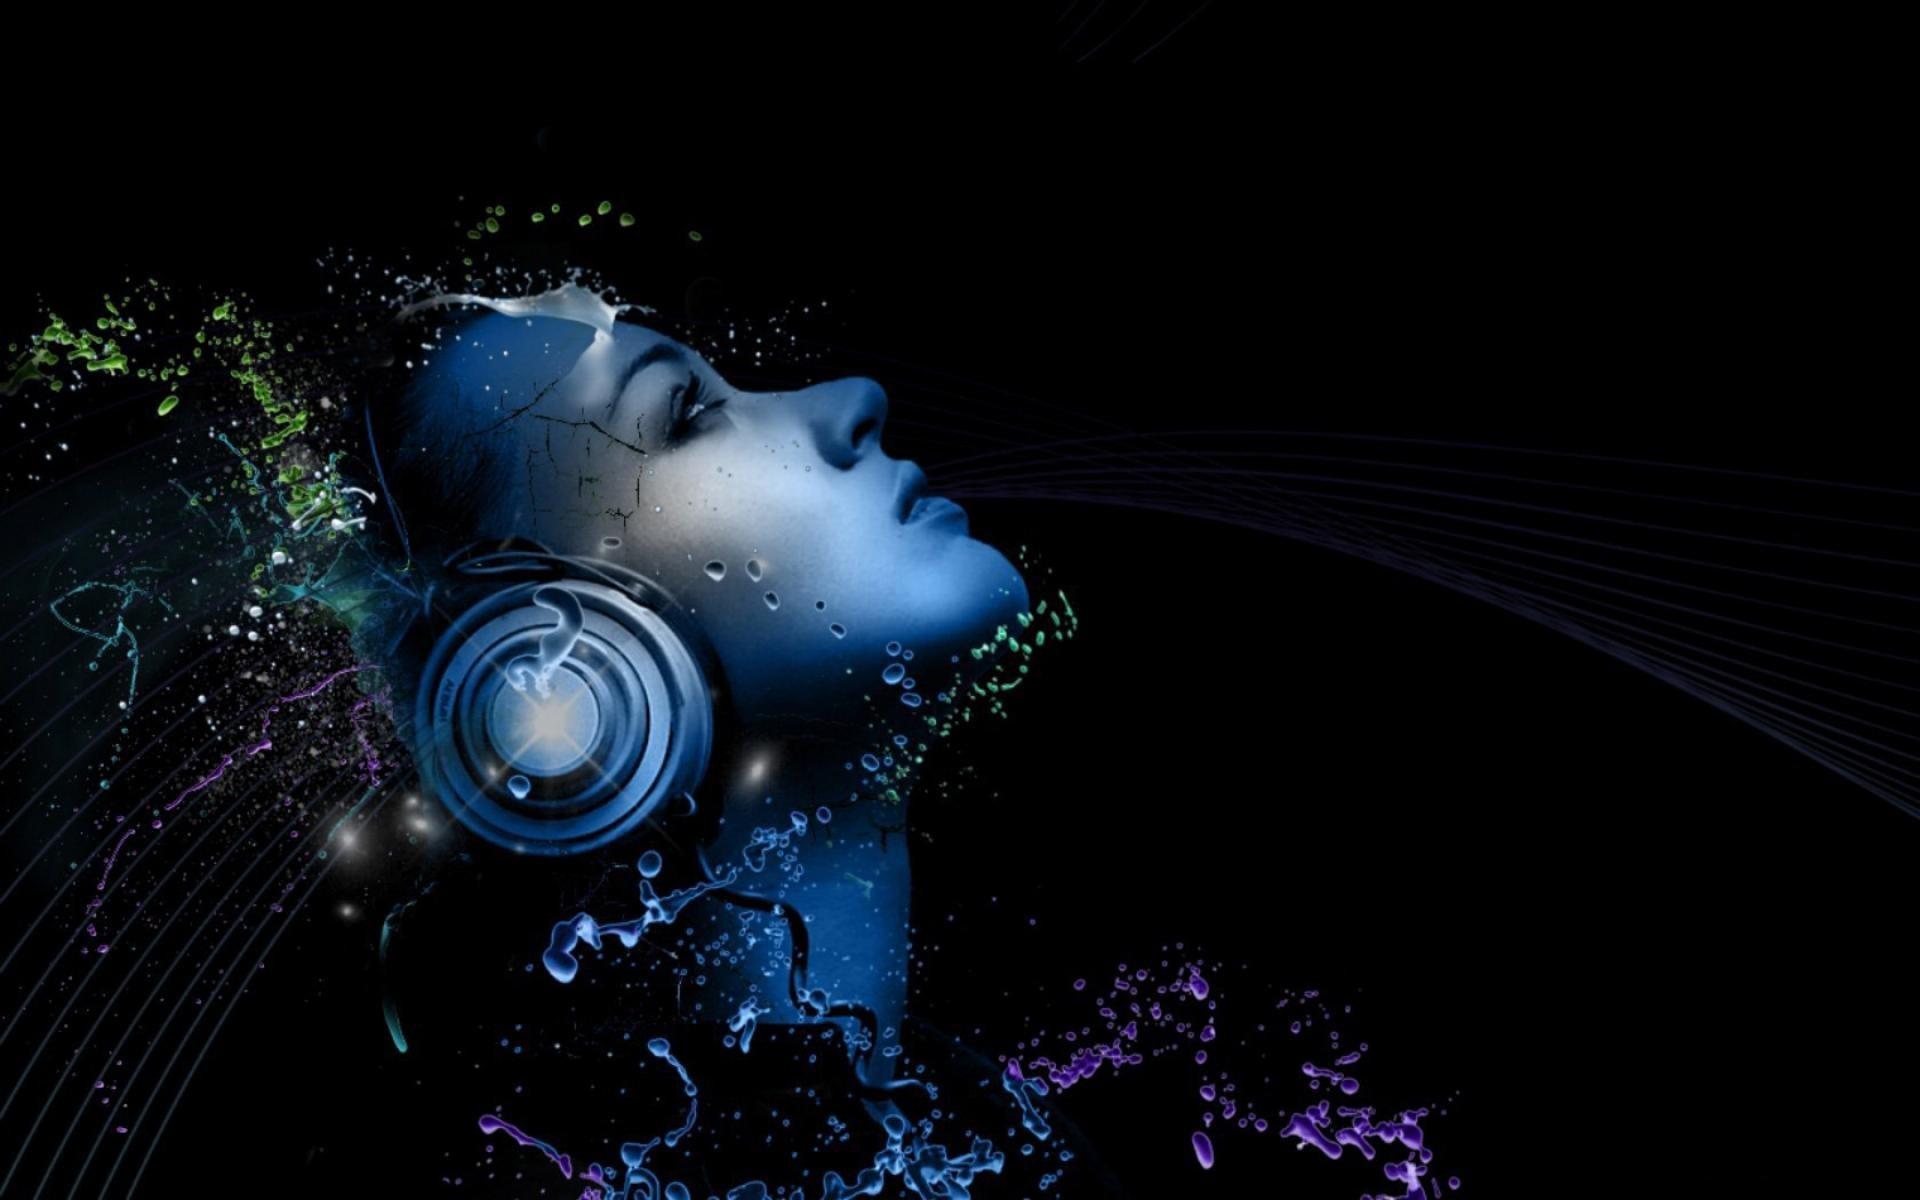 Most Inspiring Wallpaper Music Mac - 714592-dj-music-wallpaper-1920x1200-for-mac  Pictures_727755.jpg